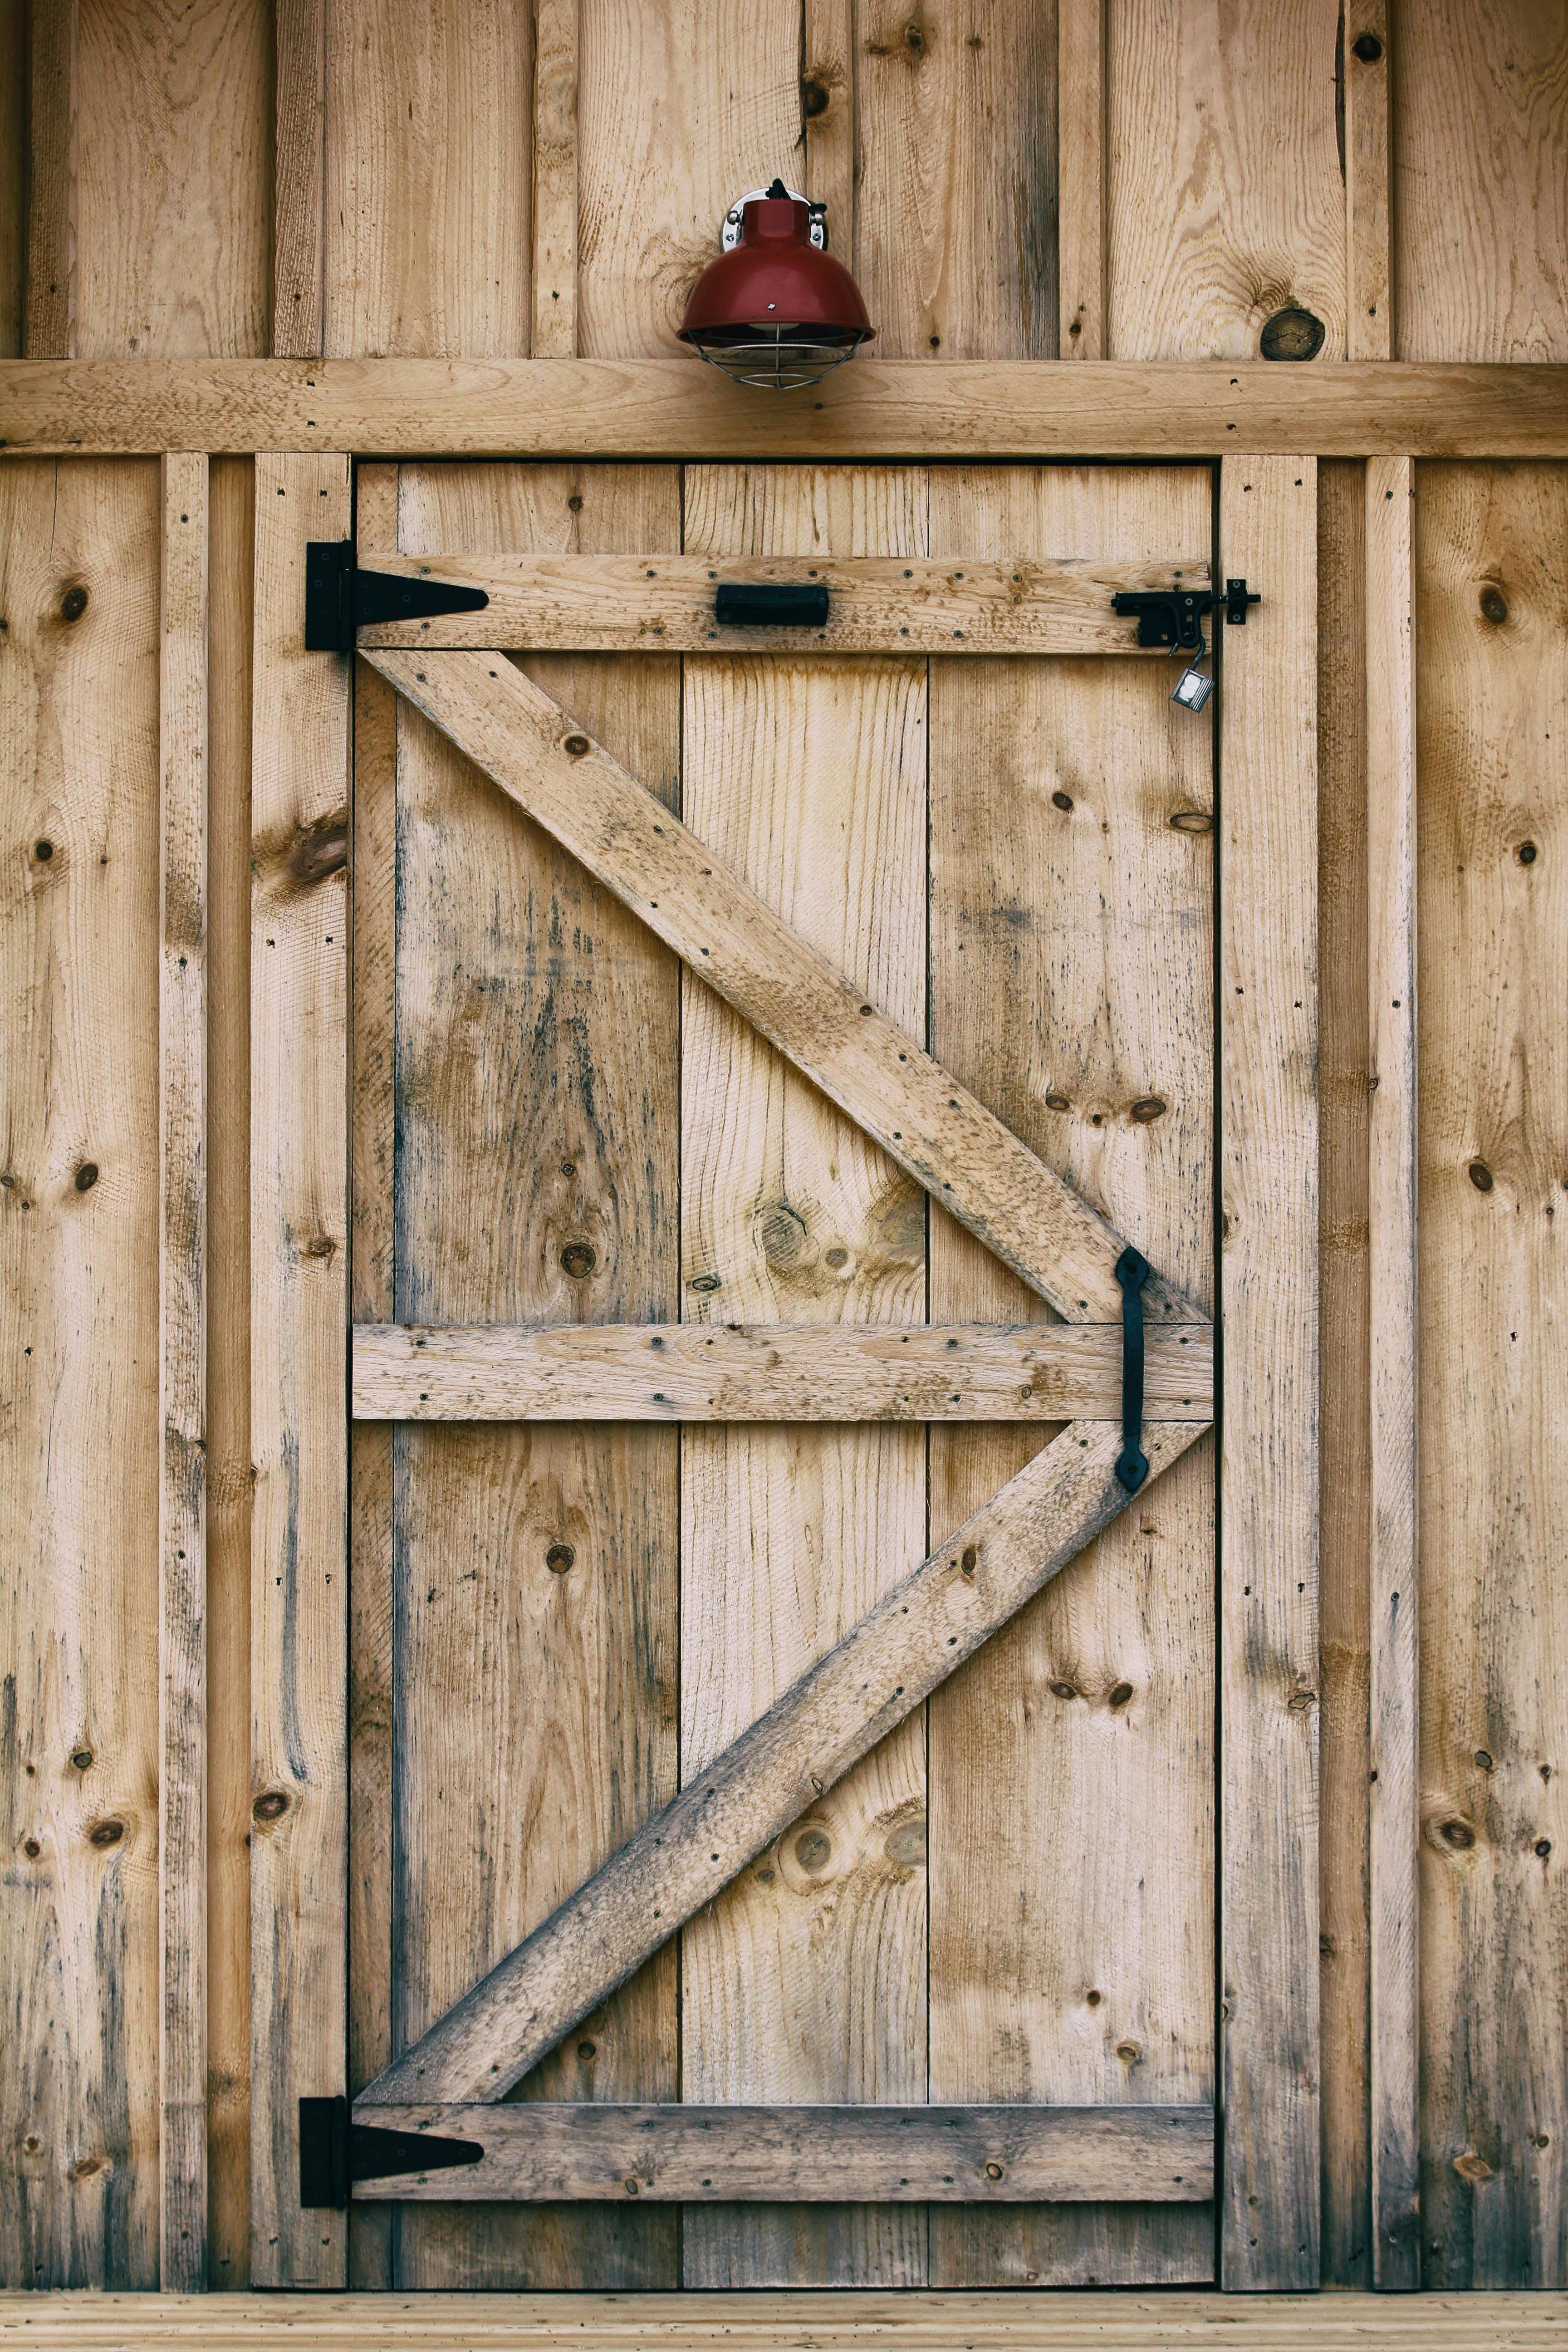 Fotos gratis : madera, casa, granero, pared, cobertizo, mueble ...